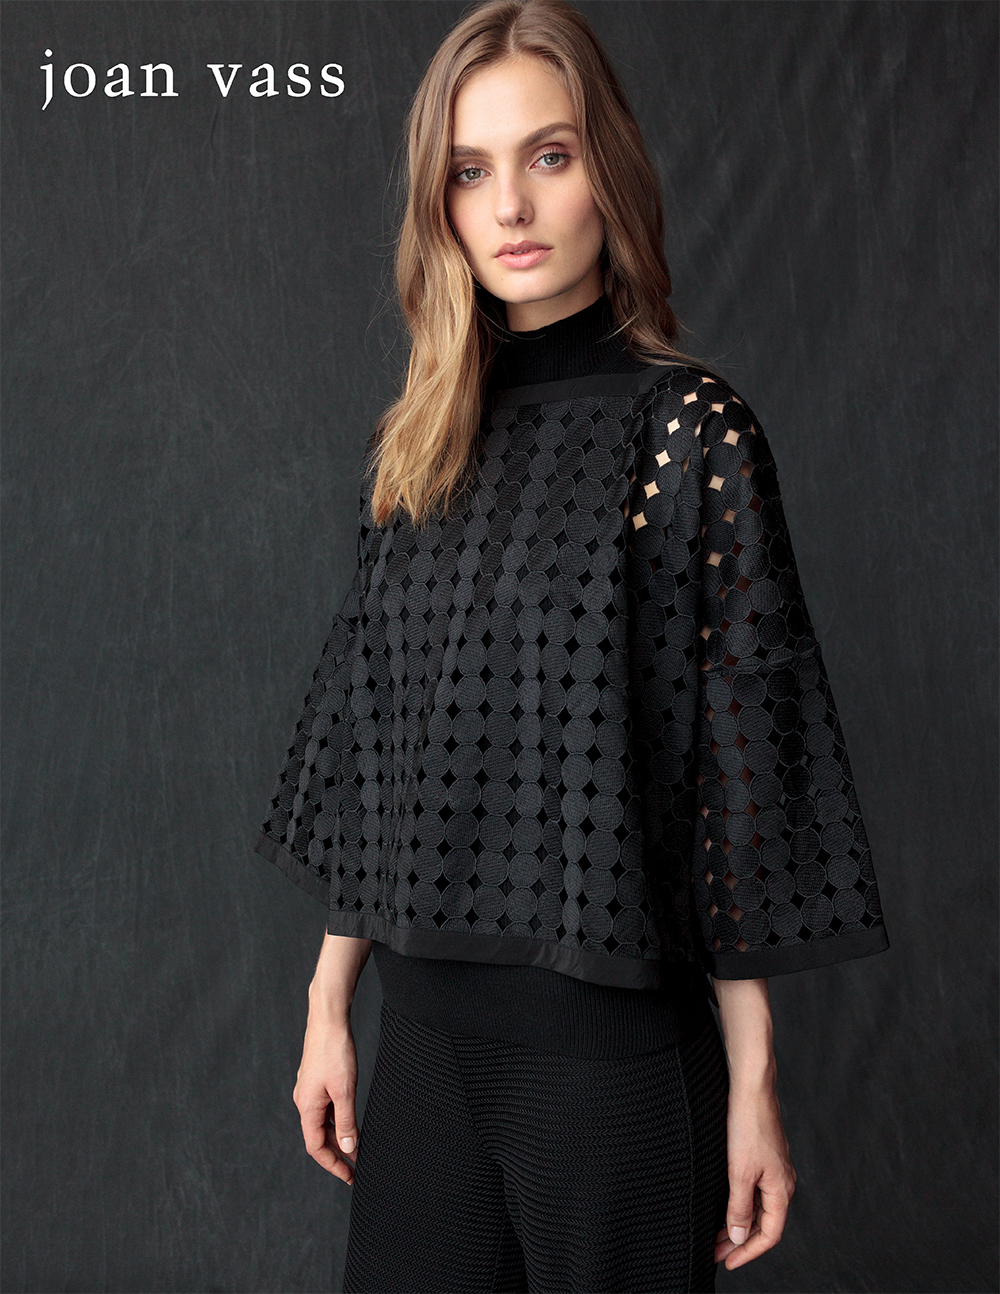 new-york-fashion-photographer-melis-dainon-joan-vass-campaign-marta-bez_2.jpg